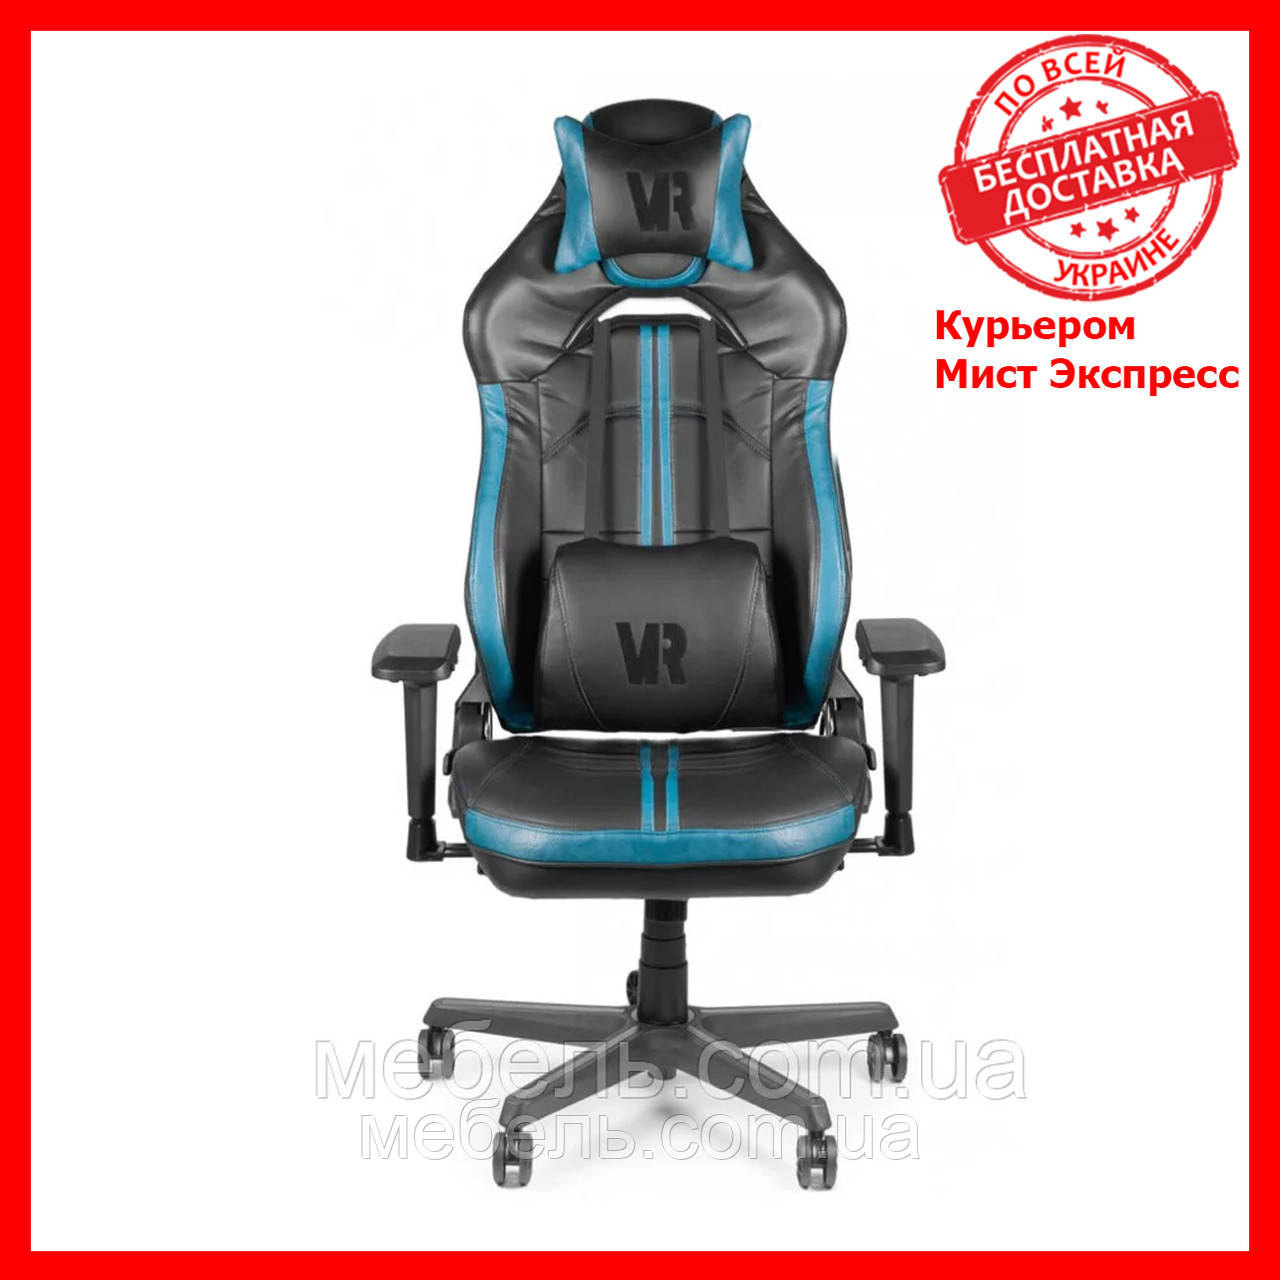 Мебель для работы дома кресло Barsky VR Cyberpunk Blue CYB-02